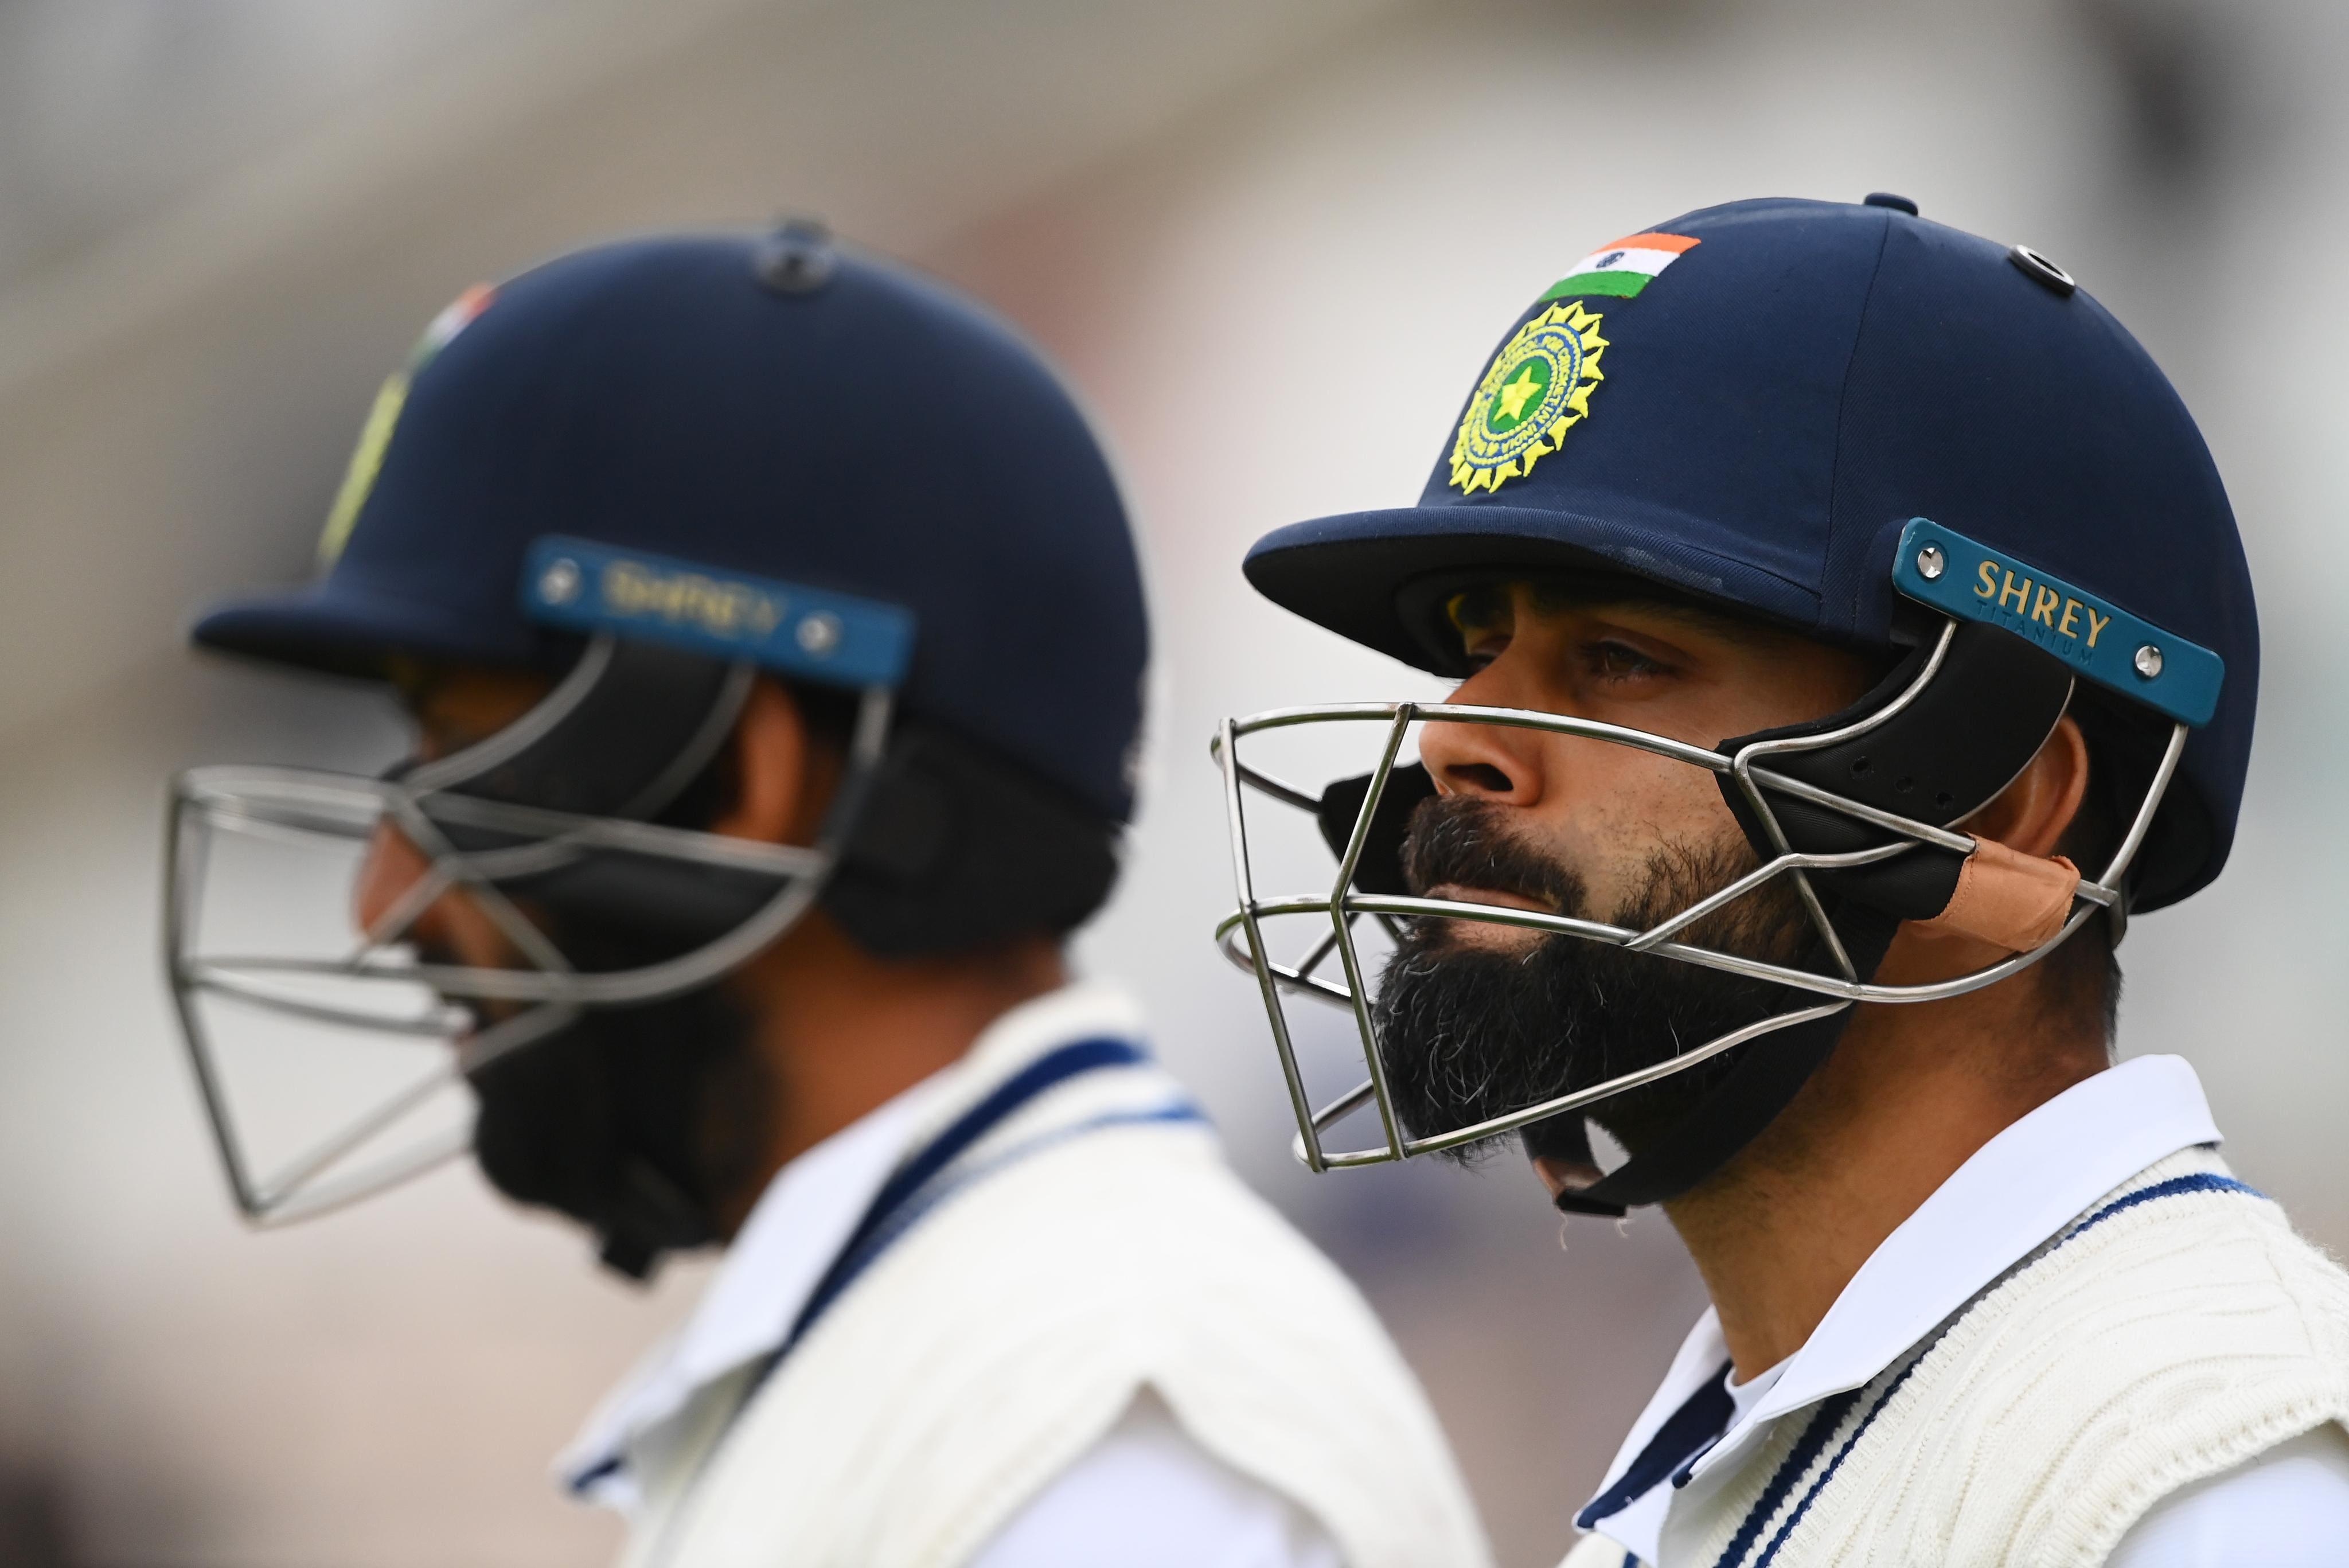 ICC WTC 2021 Finals: આ છે ભારતીય ટીમની હારના પાંચ વિલન